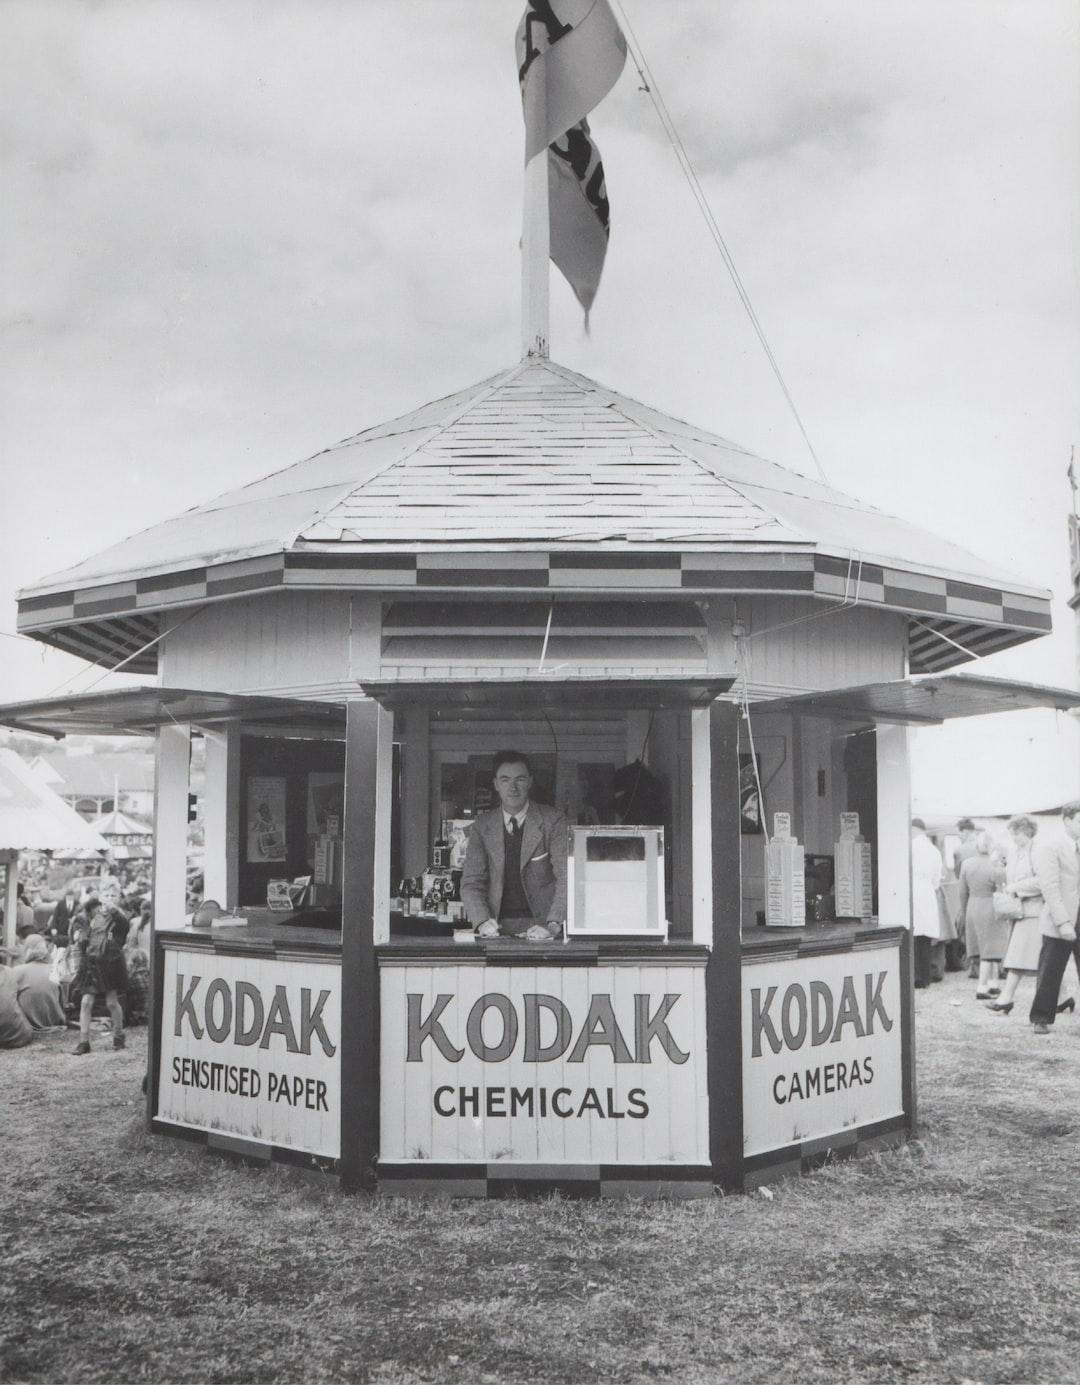 Kodak Australasia Pty Ltd, Booth in Exhibition Grounds, circa 1930s